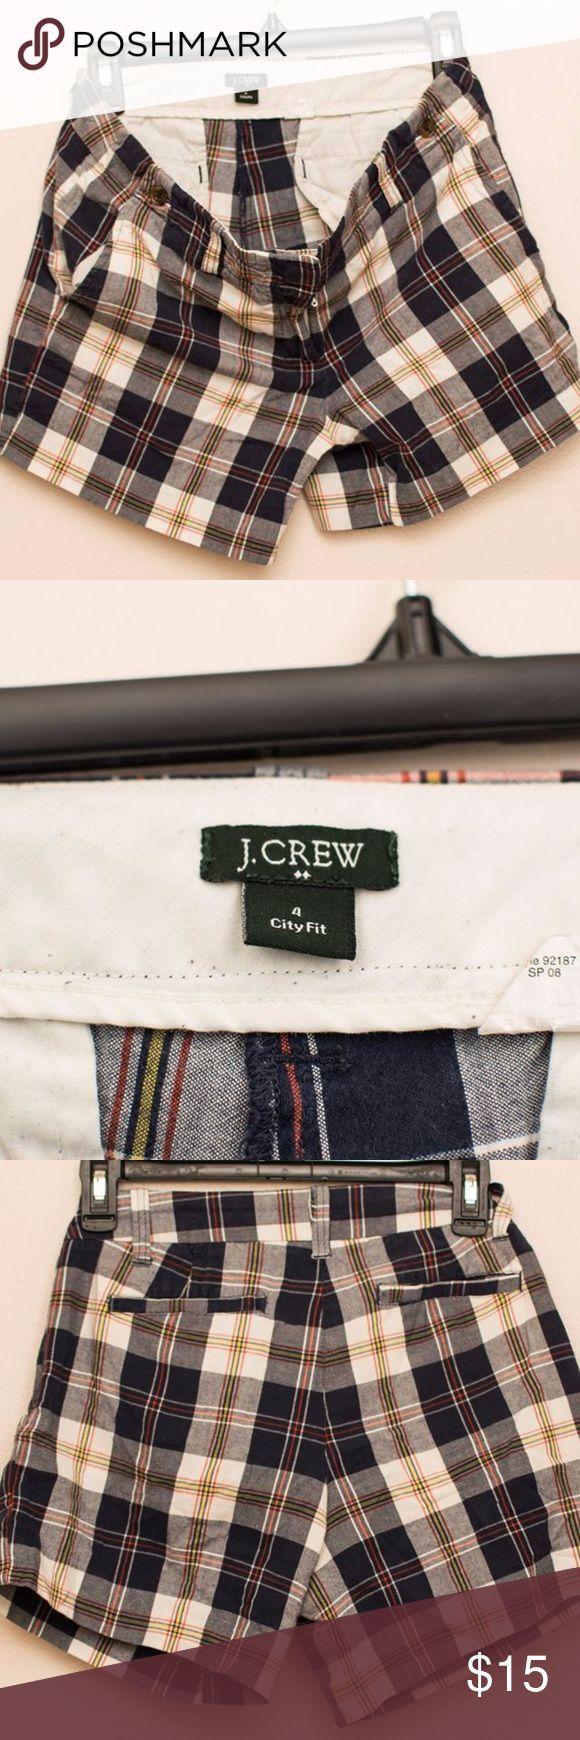 J Crew shorts J Crew factory plaid shorts J. Crew Factory Shorts